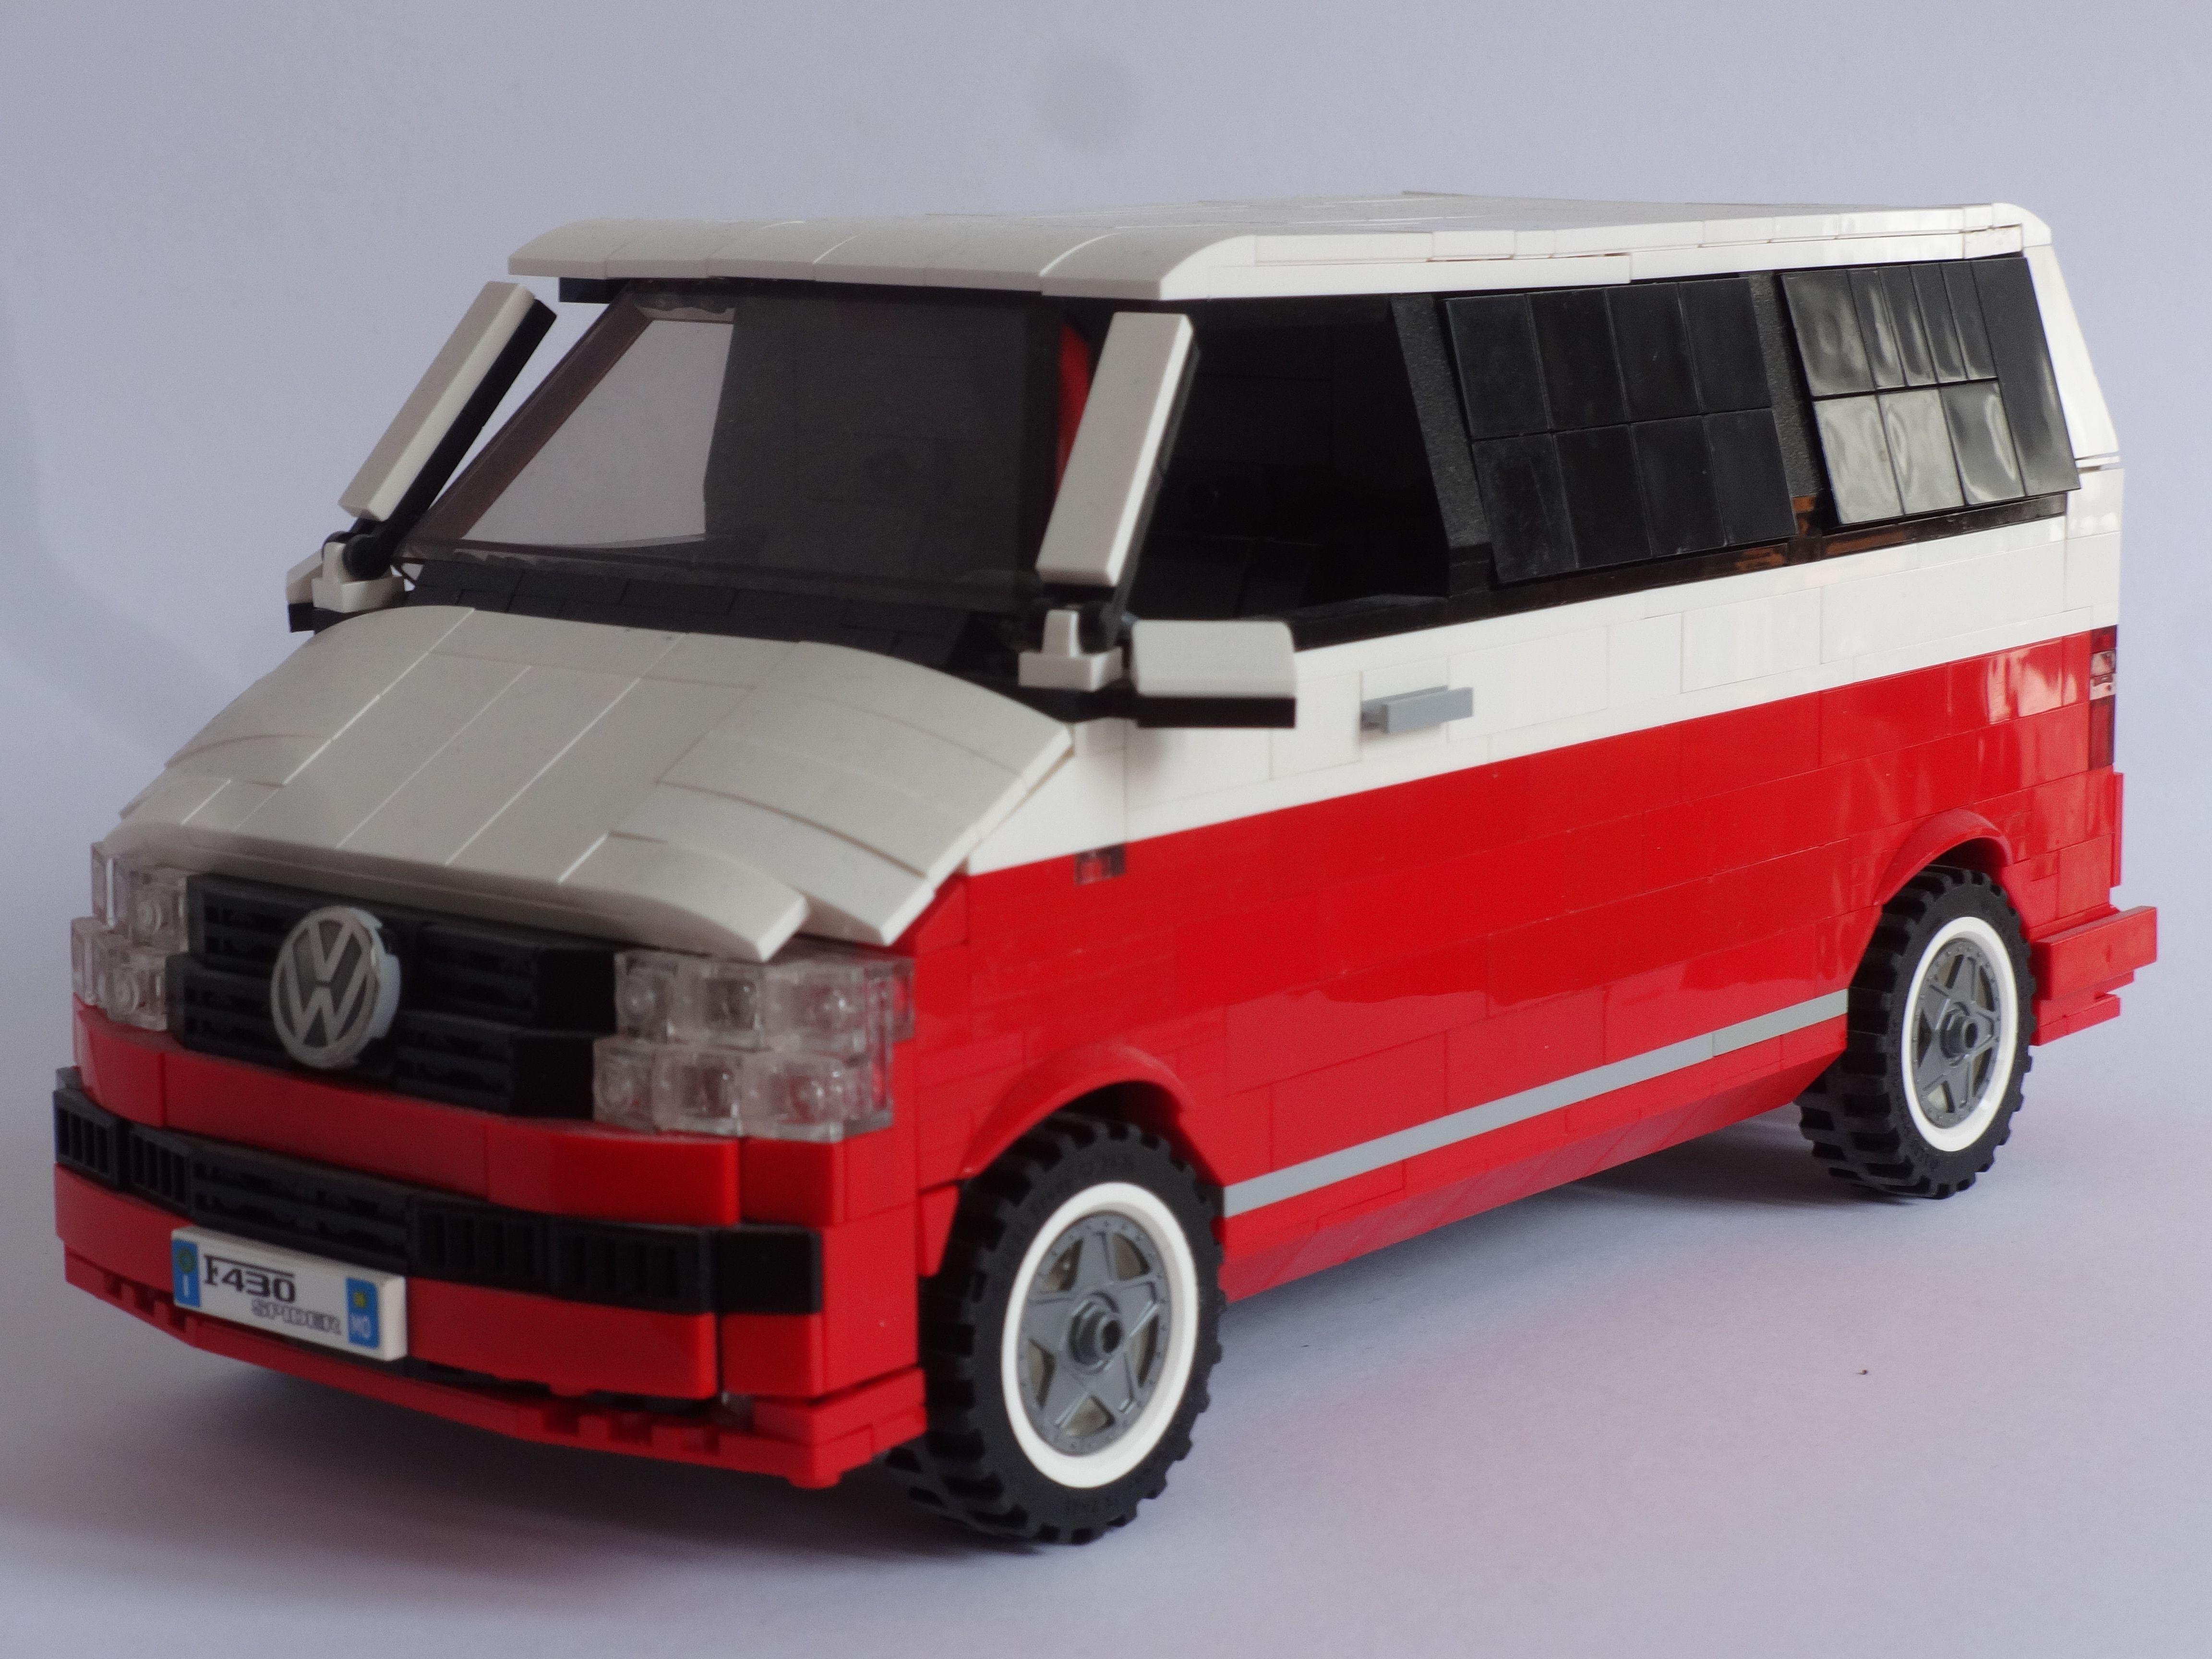 lego vw t6 lego cars lego lego creations und lego models. Black Bedroom Furniture Sets. Home Design Ideas